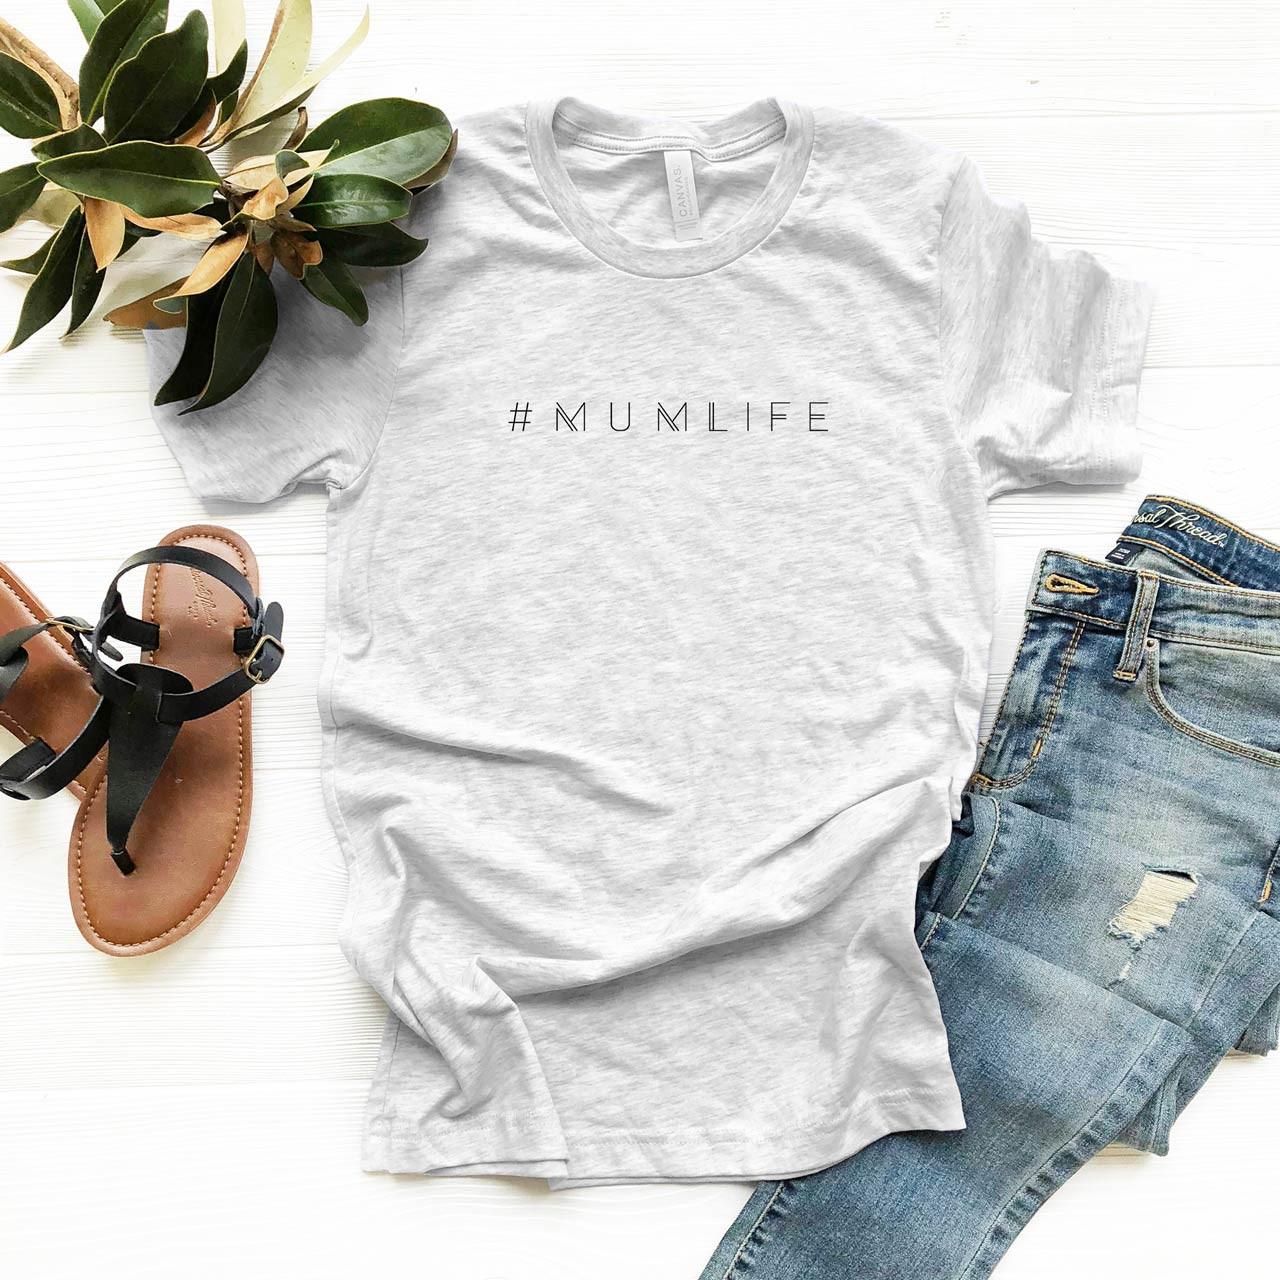 #MUMLIFE Vintage T-Shirt (Black on Light Gray Fleck) from The Printed Home